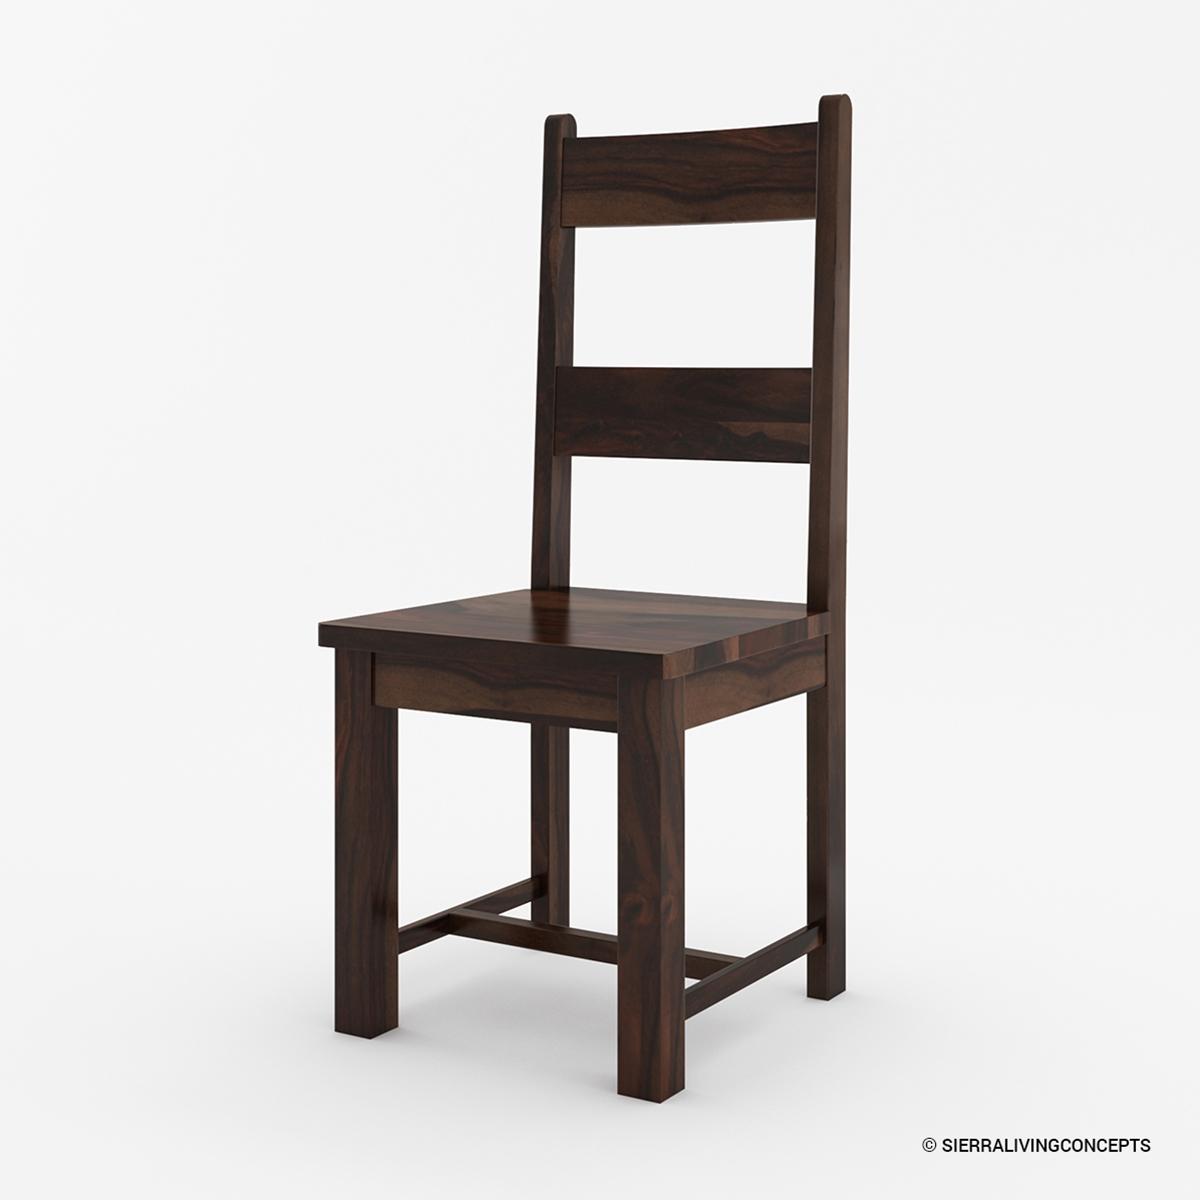 Rustic Modern Wood Dining Chair: Frisco Modern Rustic Solid Wood Ladder Back Dining Chair